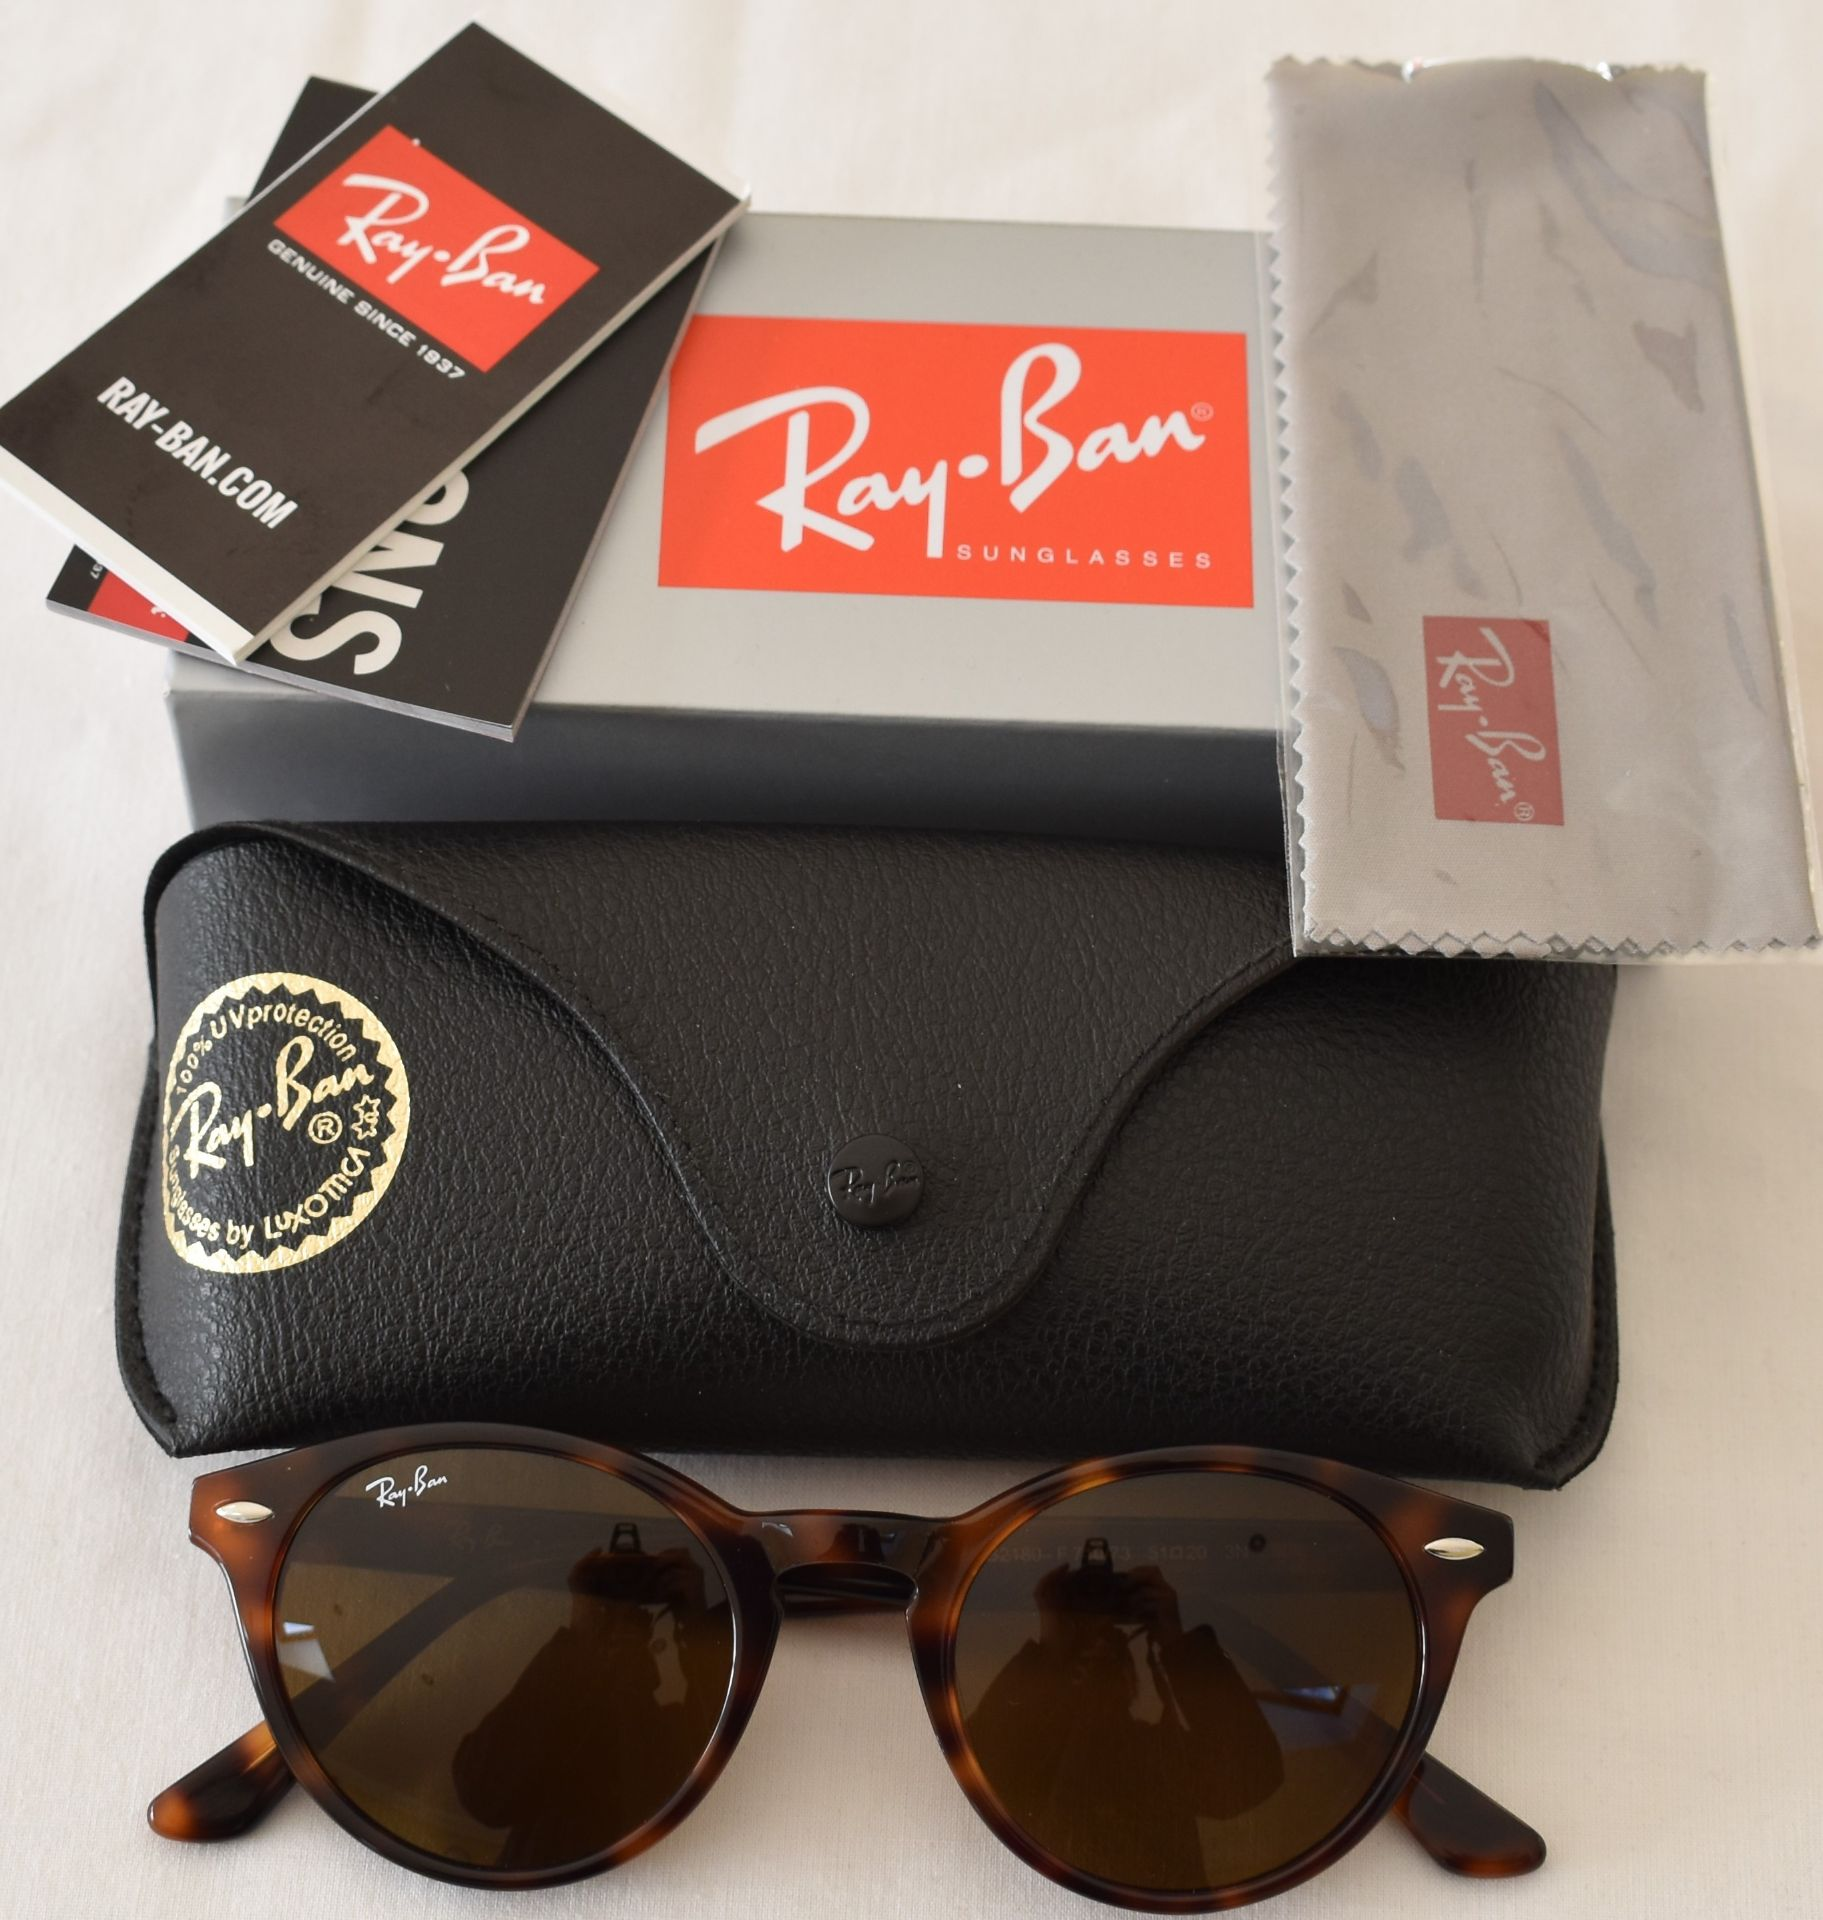 Ray Ban Sunglasses ORB2180F 710/73RB *3N - Image 3 of 3